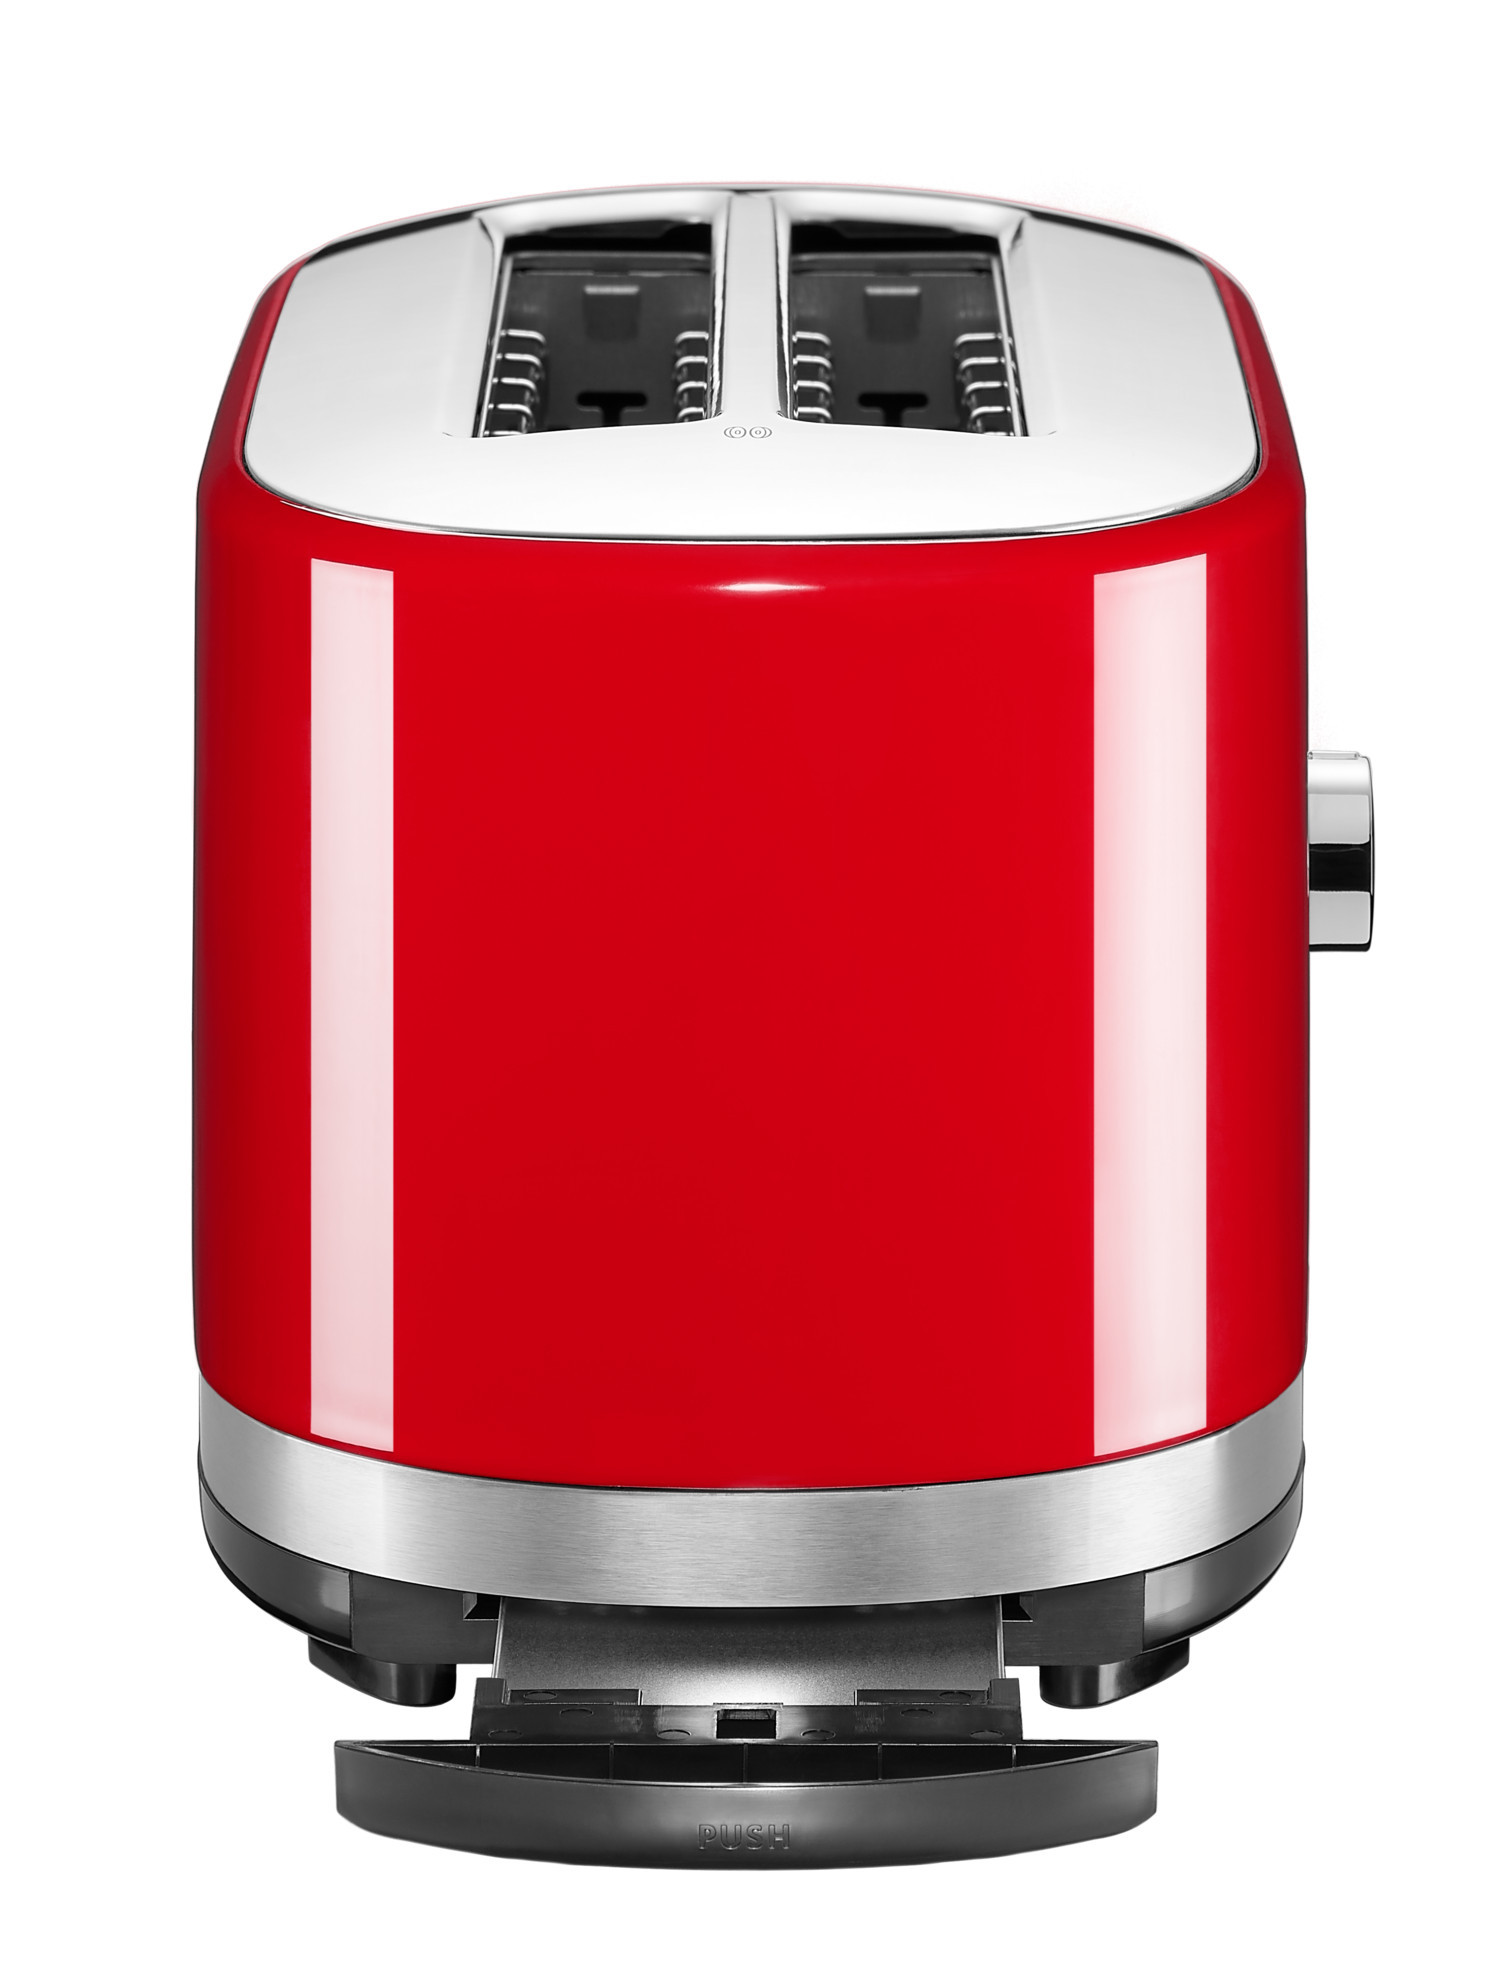 KitchenAid manueller Langschlitz-Toaster